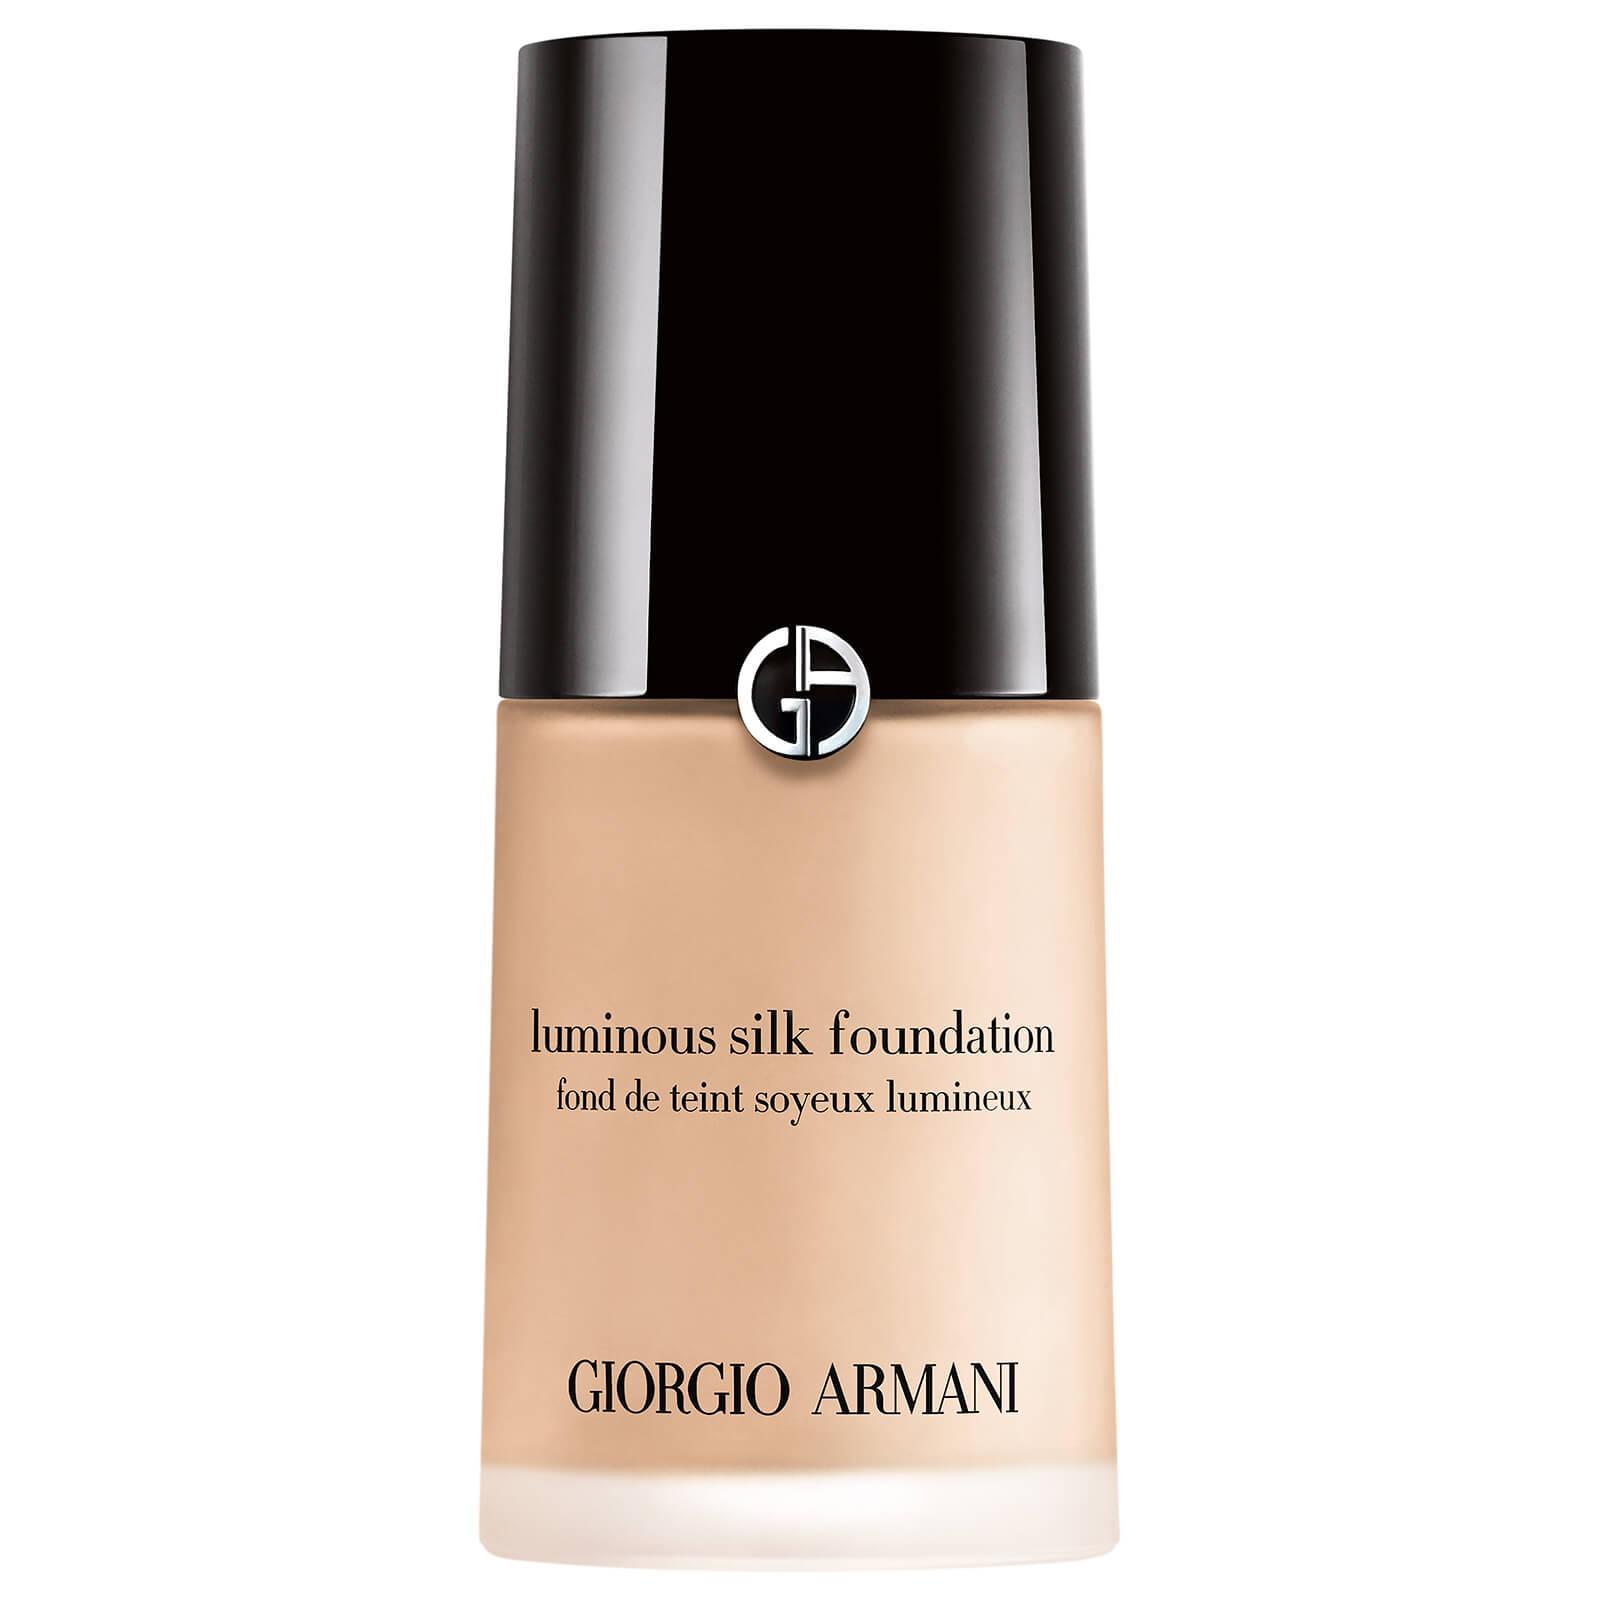 ee6a1ad5565 Giorgio Armani Luminous Silk Foundation 30ml (Various Shades)